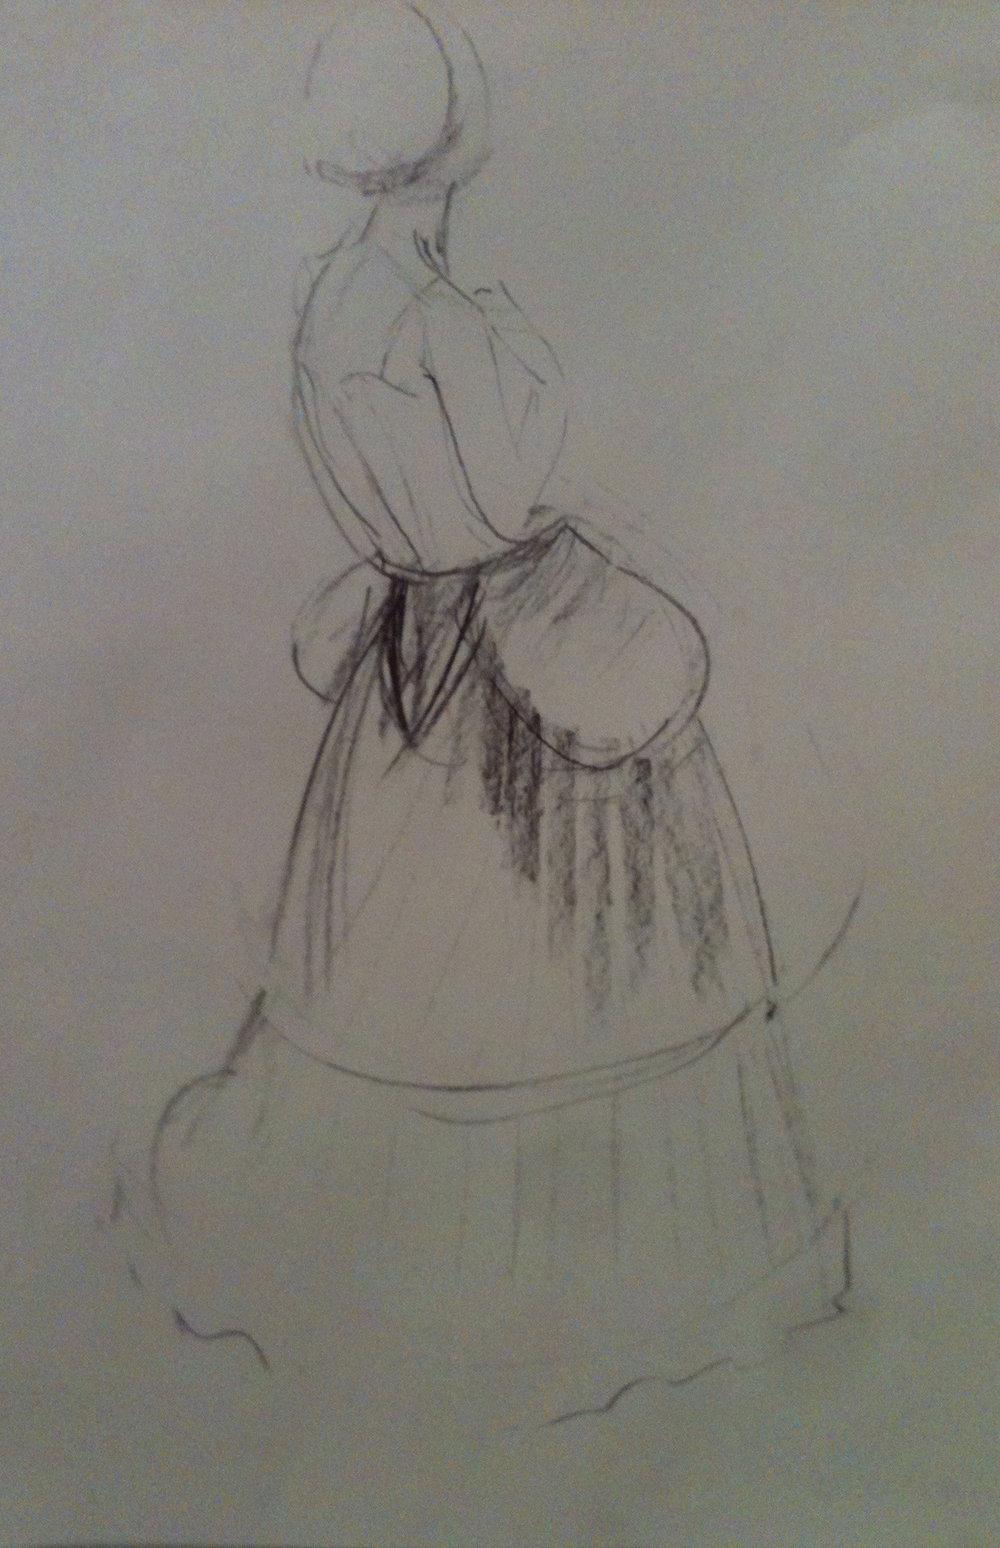 Girl in a petticoat